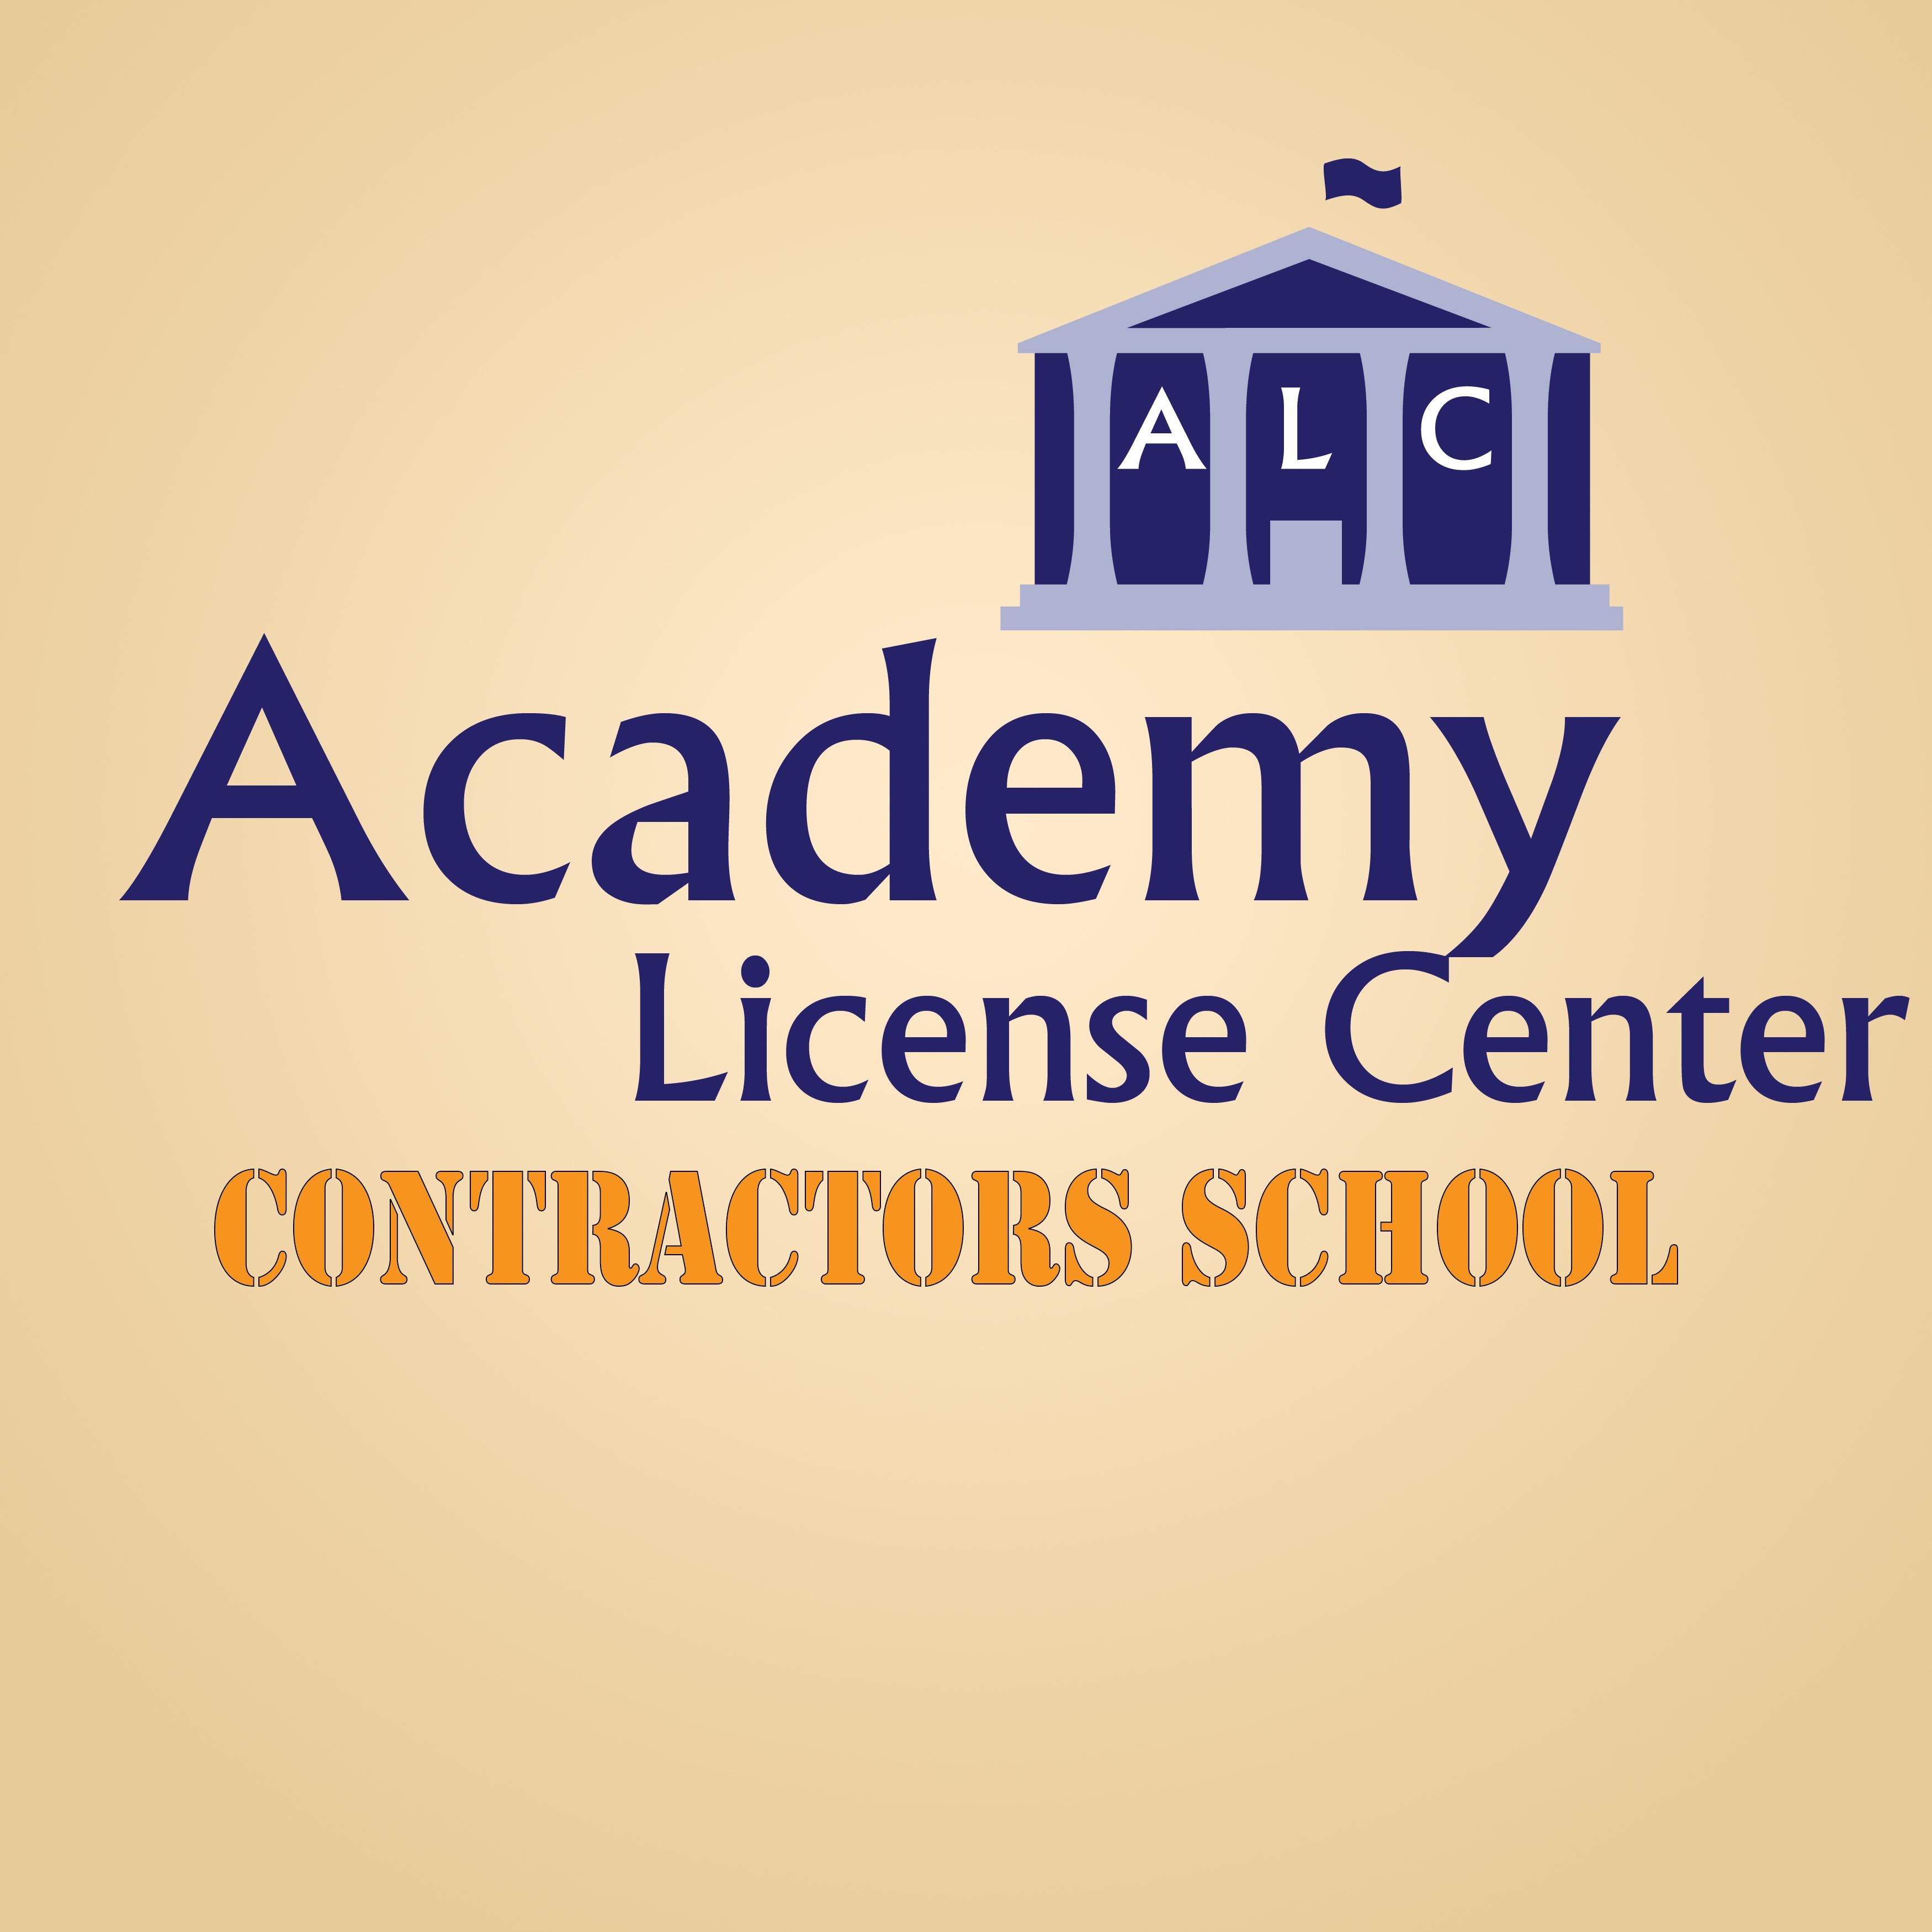 Academy License Center Contractors School